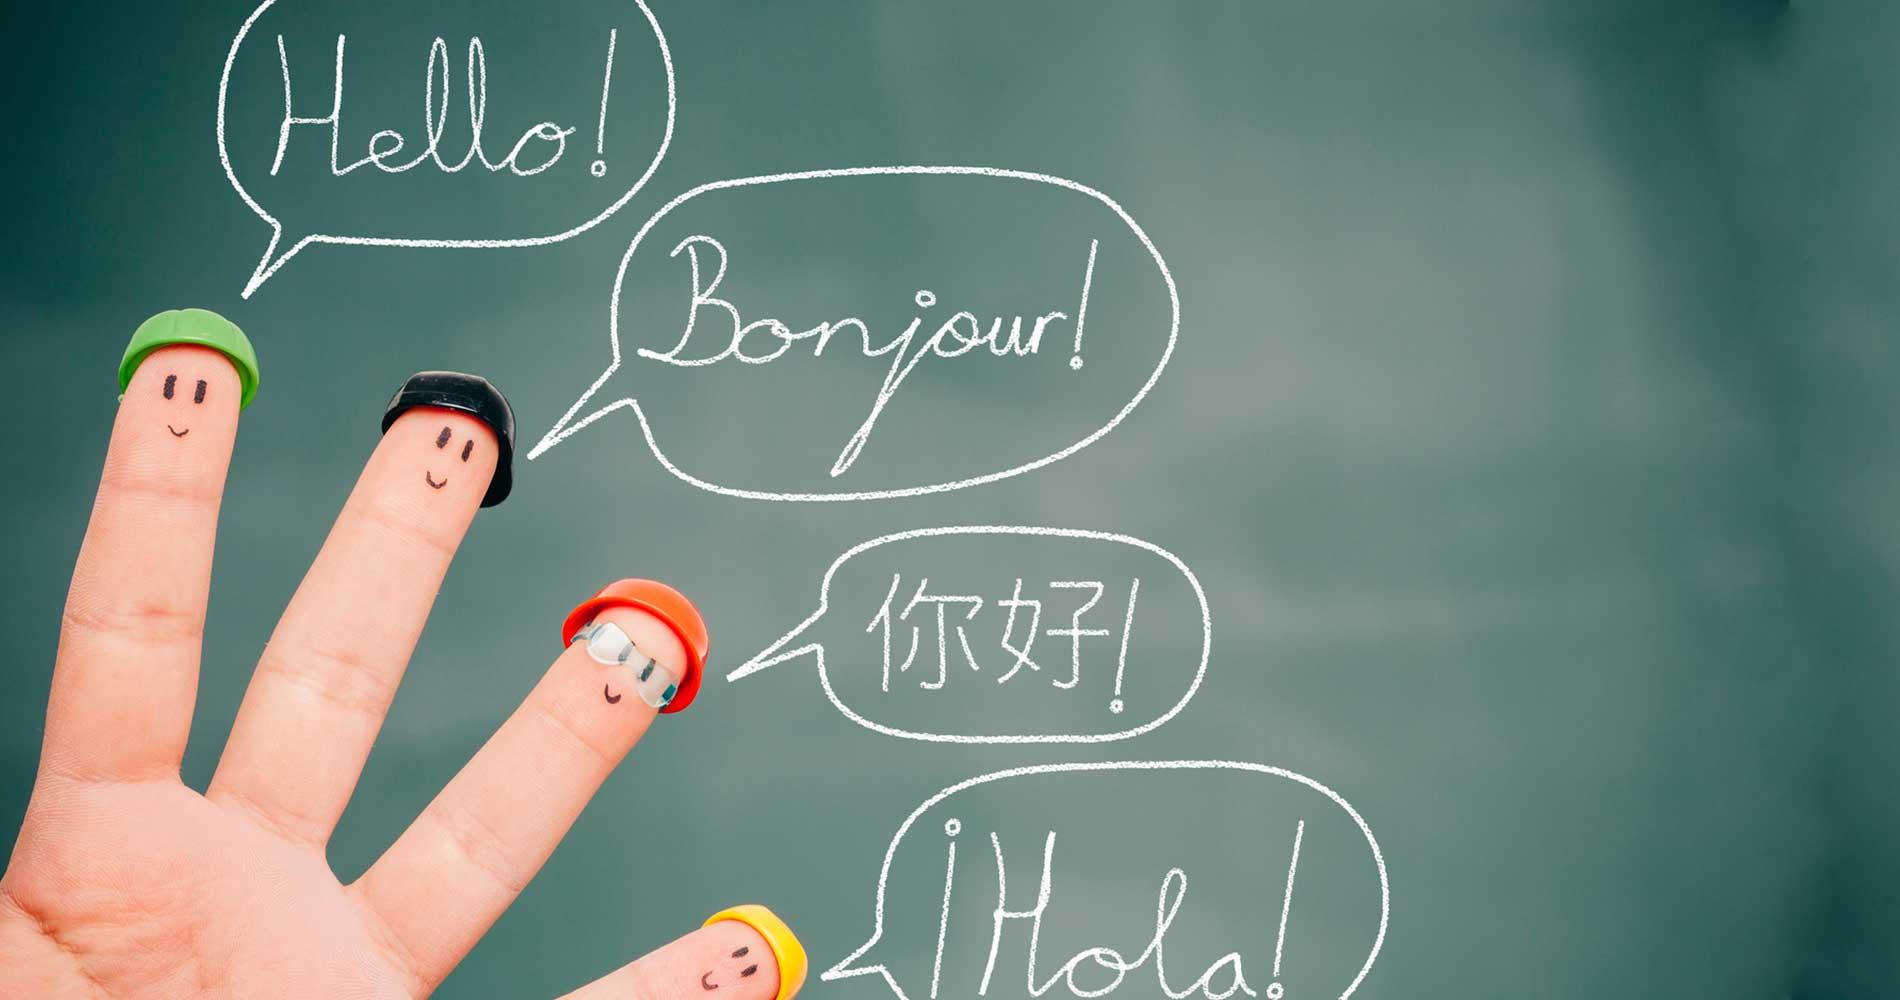 aula-de-idiomas-empresa-de-formacion-online—academia-online-de-idioma 2